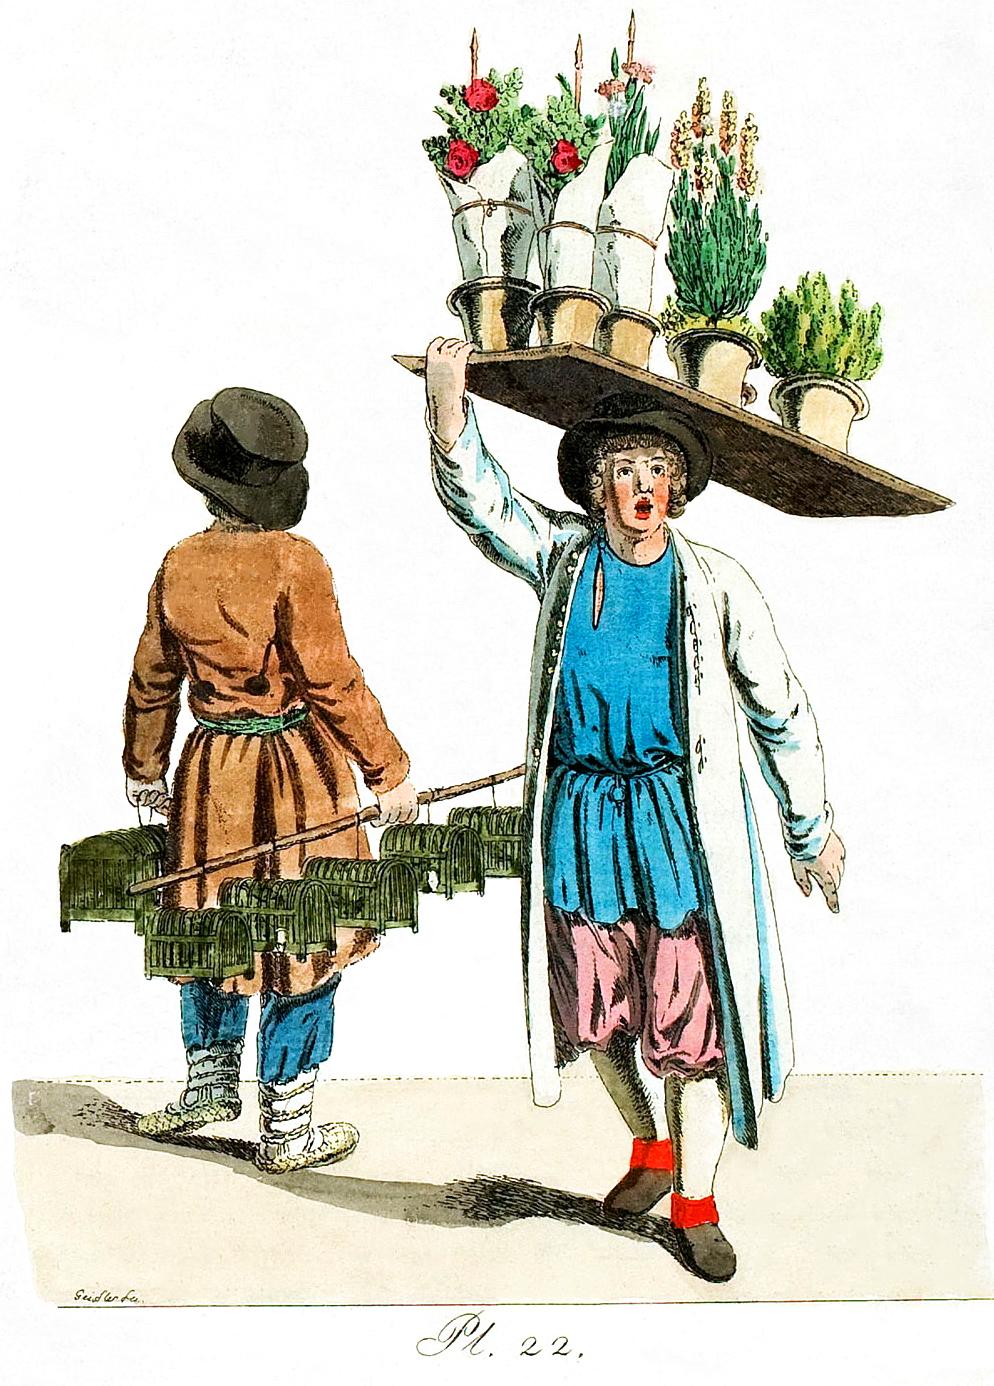 22.Karnarienvogelverkäufers und eines Blumenverkäufers / Продавец птиц и цветочник